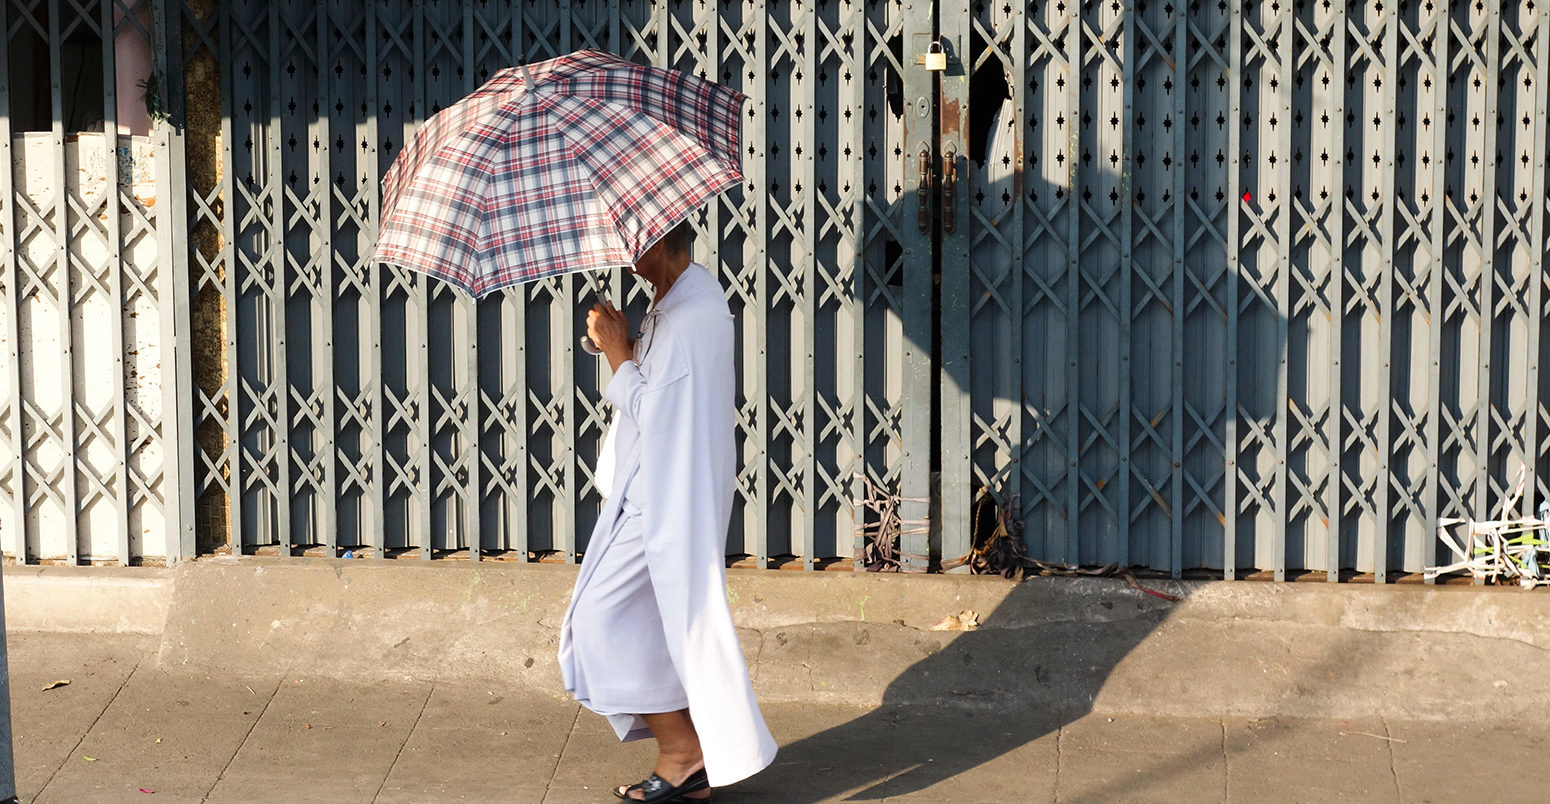 Buddhist Man with umbrella against sun walking in street, Bangkok, Thailand, Southeast Asia.